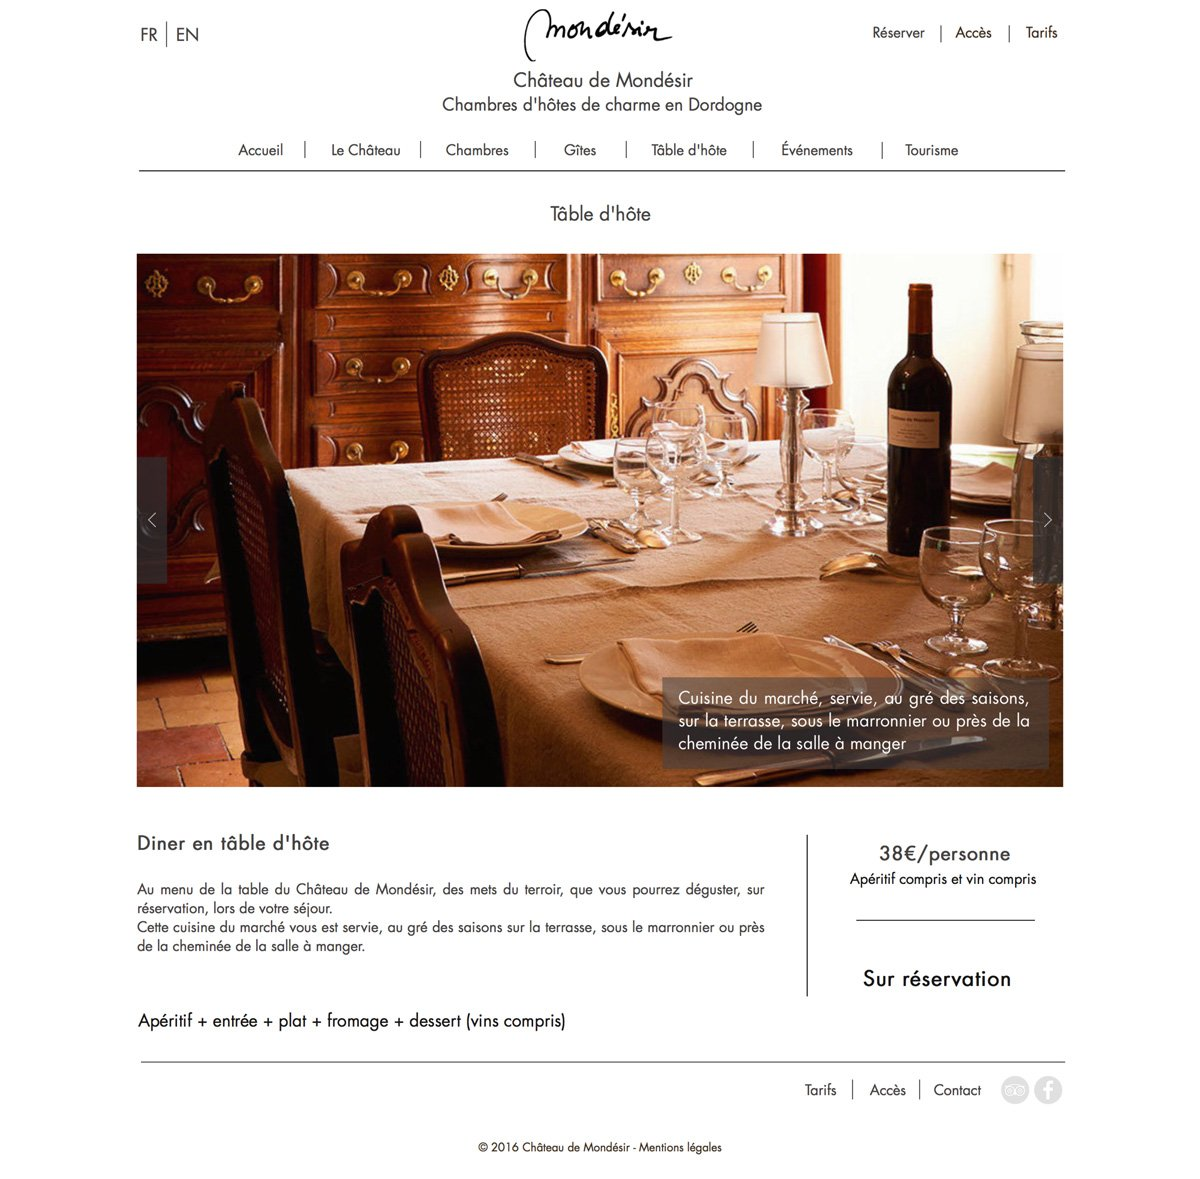 cmth webatheart - Web at Heart, agence digitale à Lyon